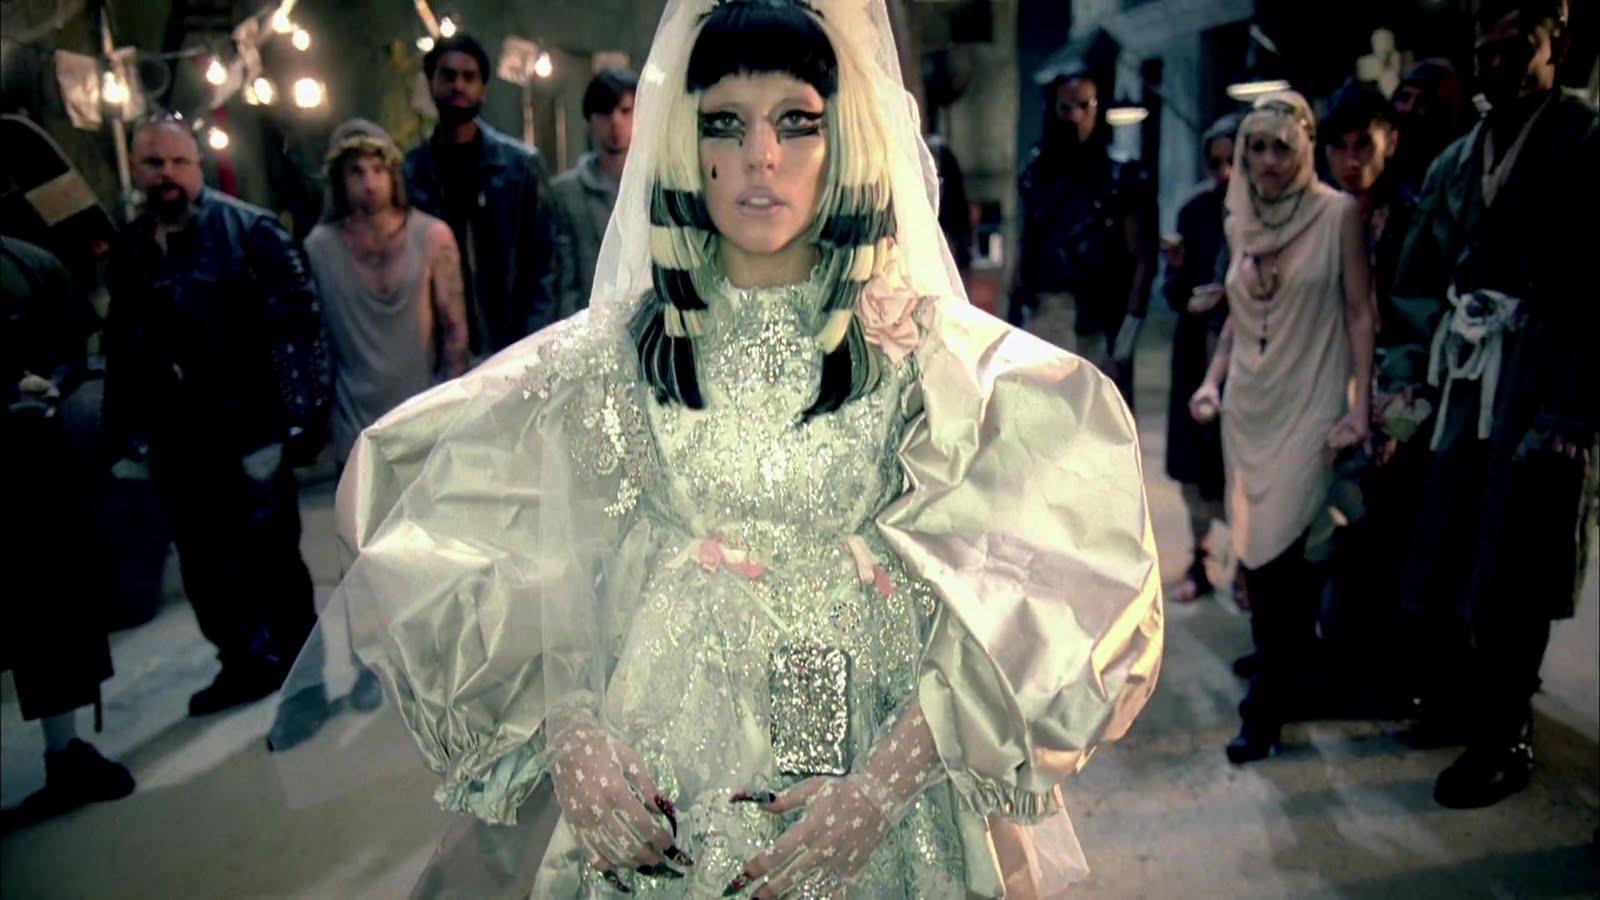 http://3.bp.blogspot.com/-aaurJkW87pc/TdPGMln0e9I/AAAAAAAAC_M/7mNsvJf0Mdc/s1600/Lady_Gaga_-_Judas__+1603+%25281477%2529.jpg